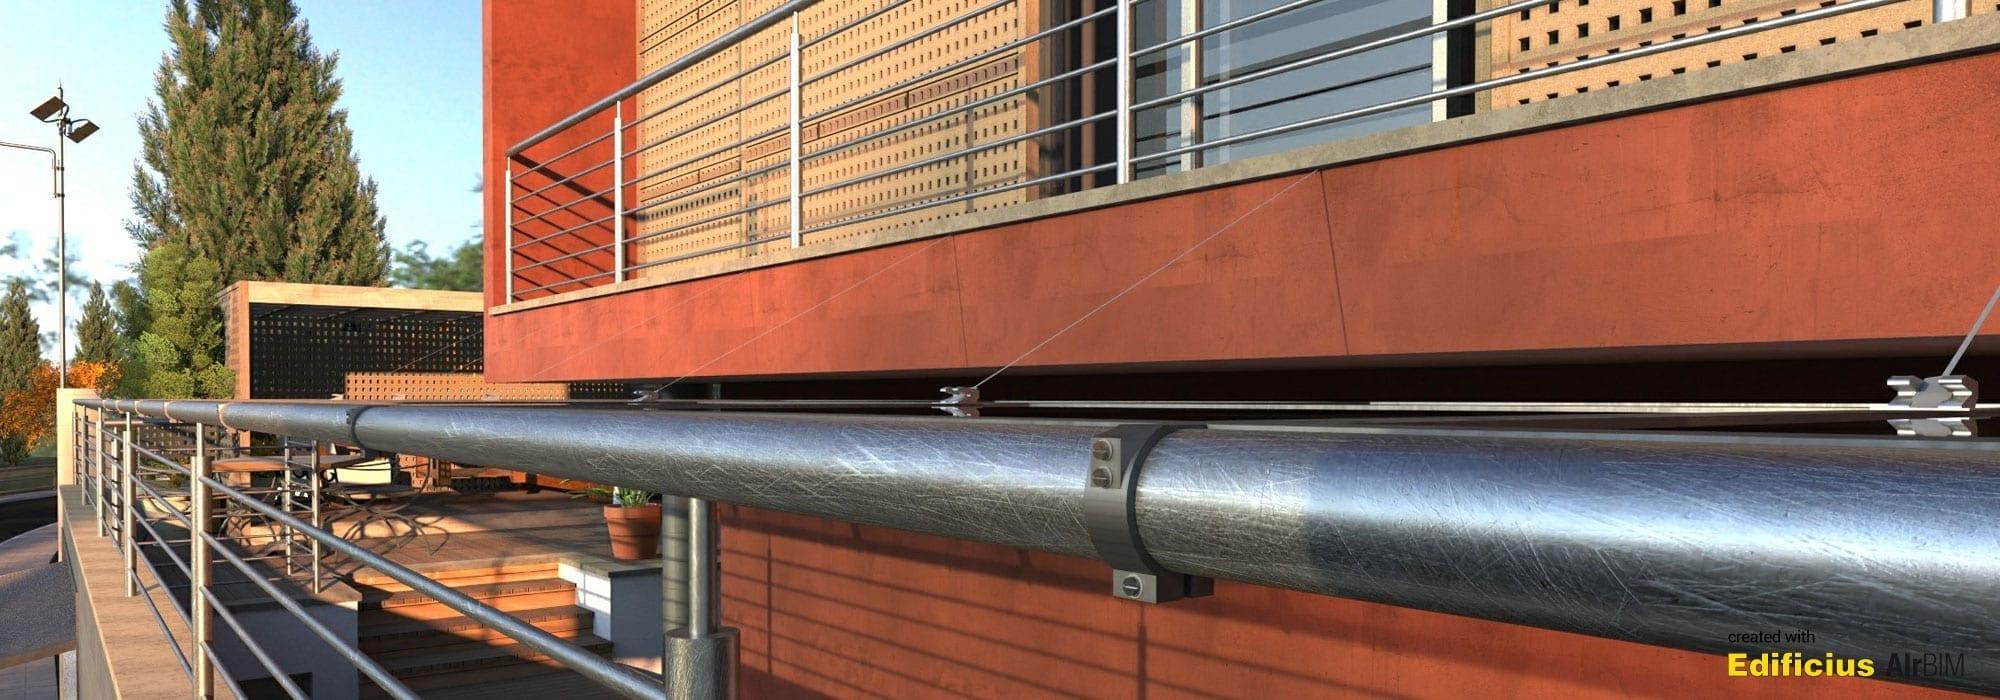 Renderizações foto realistas de arquitetura 4 | Edificius+AIrBIM | ACCA software